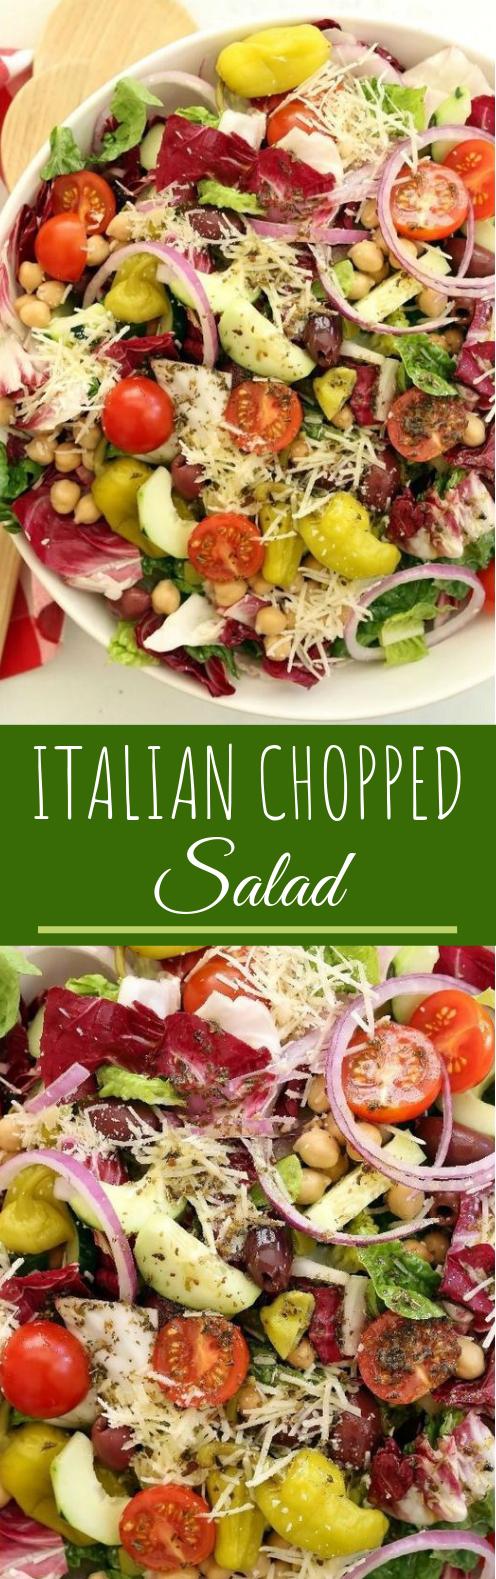 Italian Chopped Salad #healthy #sidedish